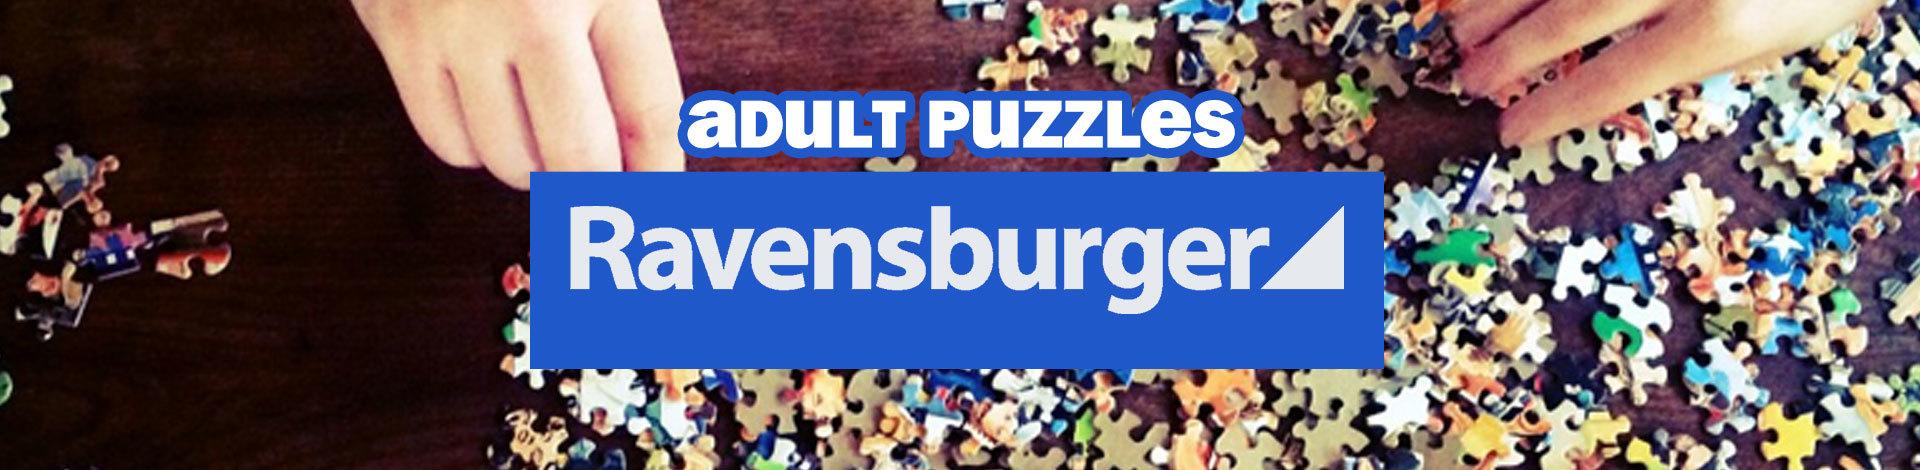 Adults Ravensburger Puzzles